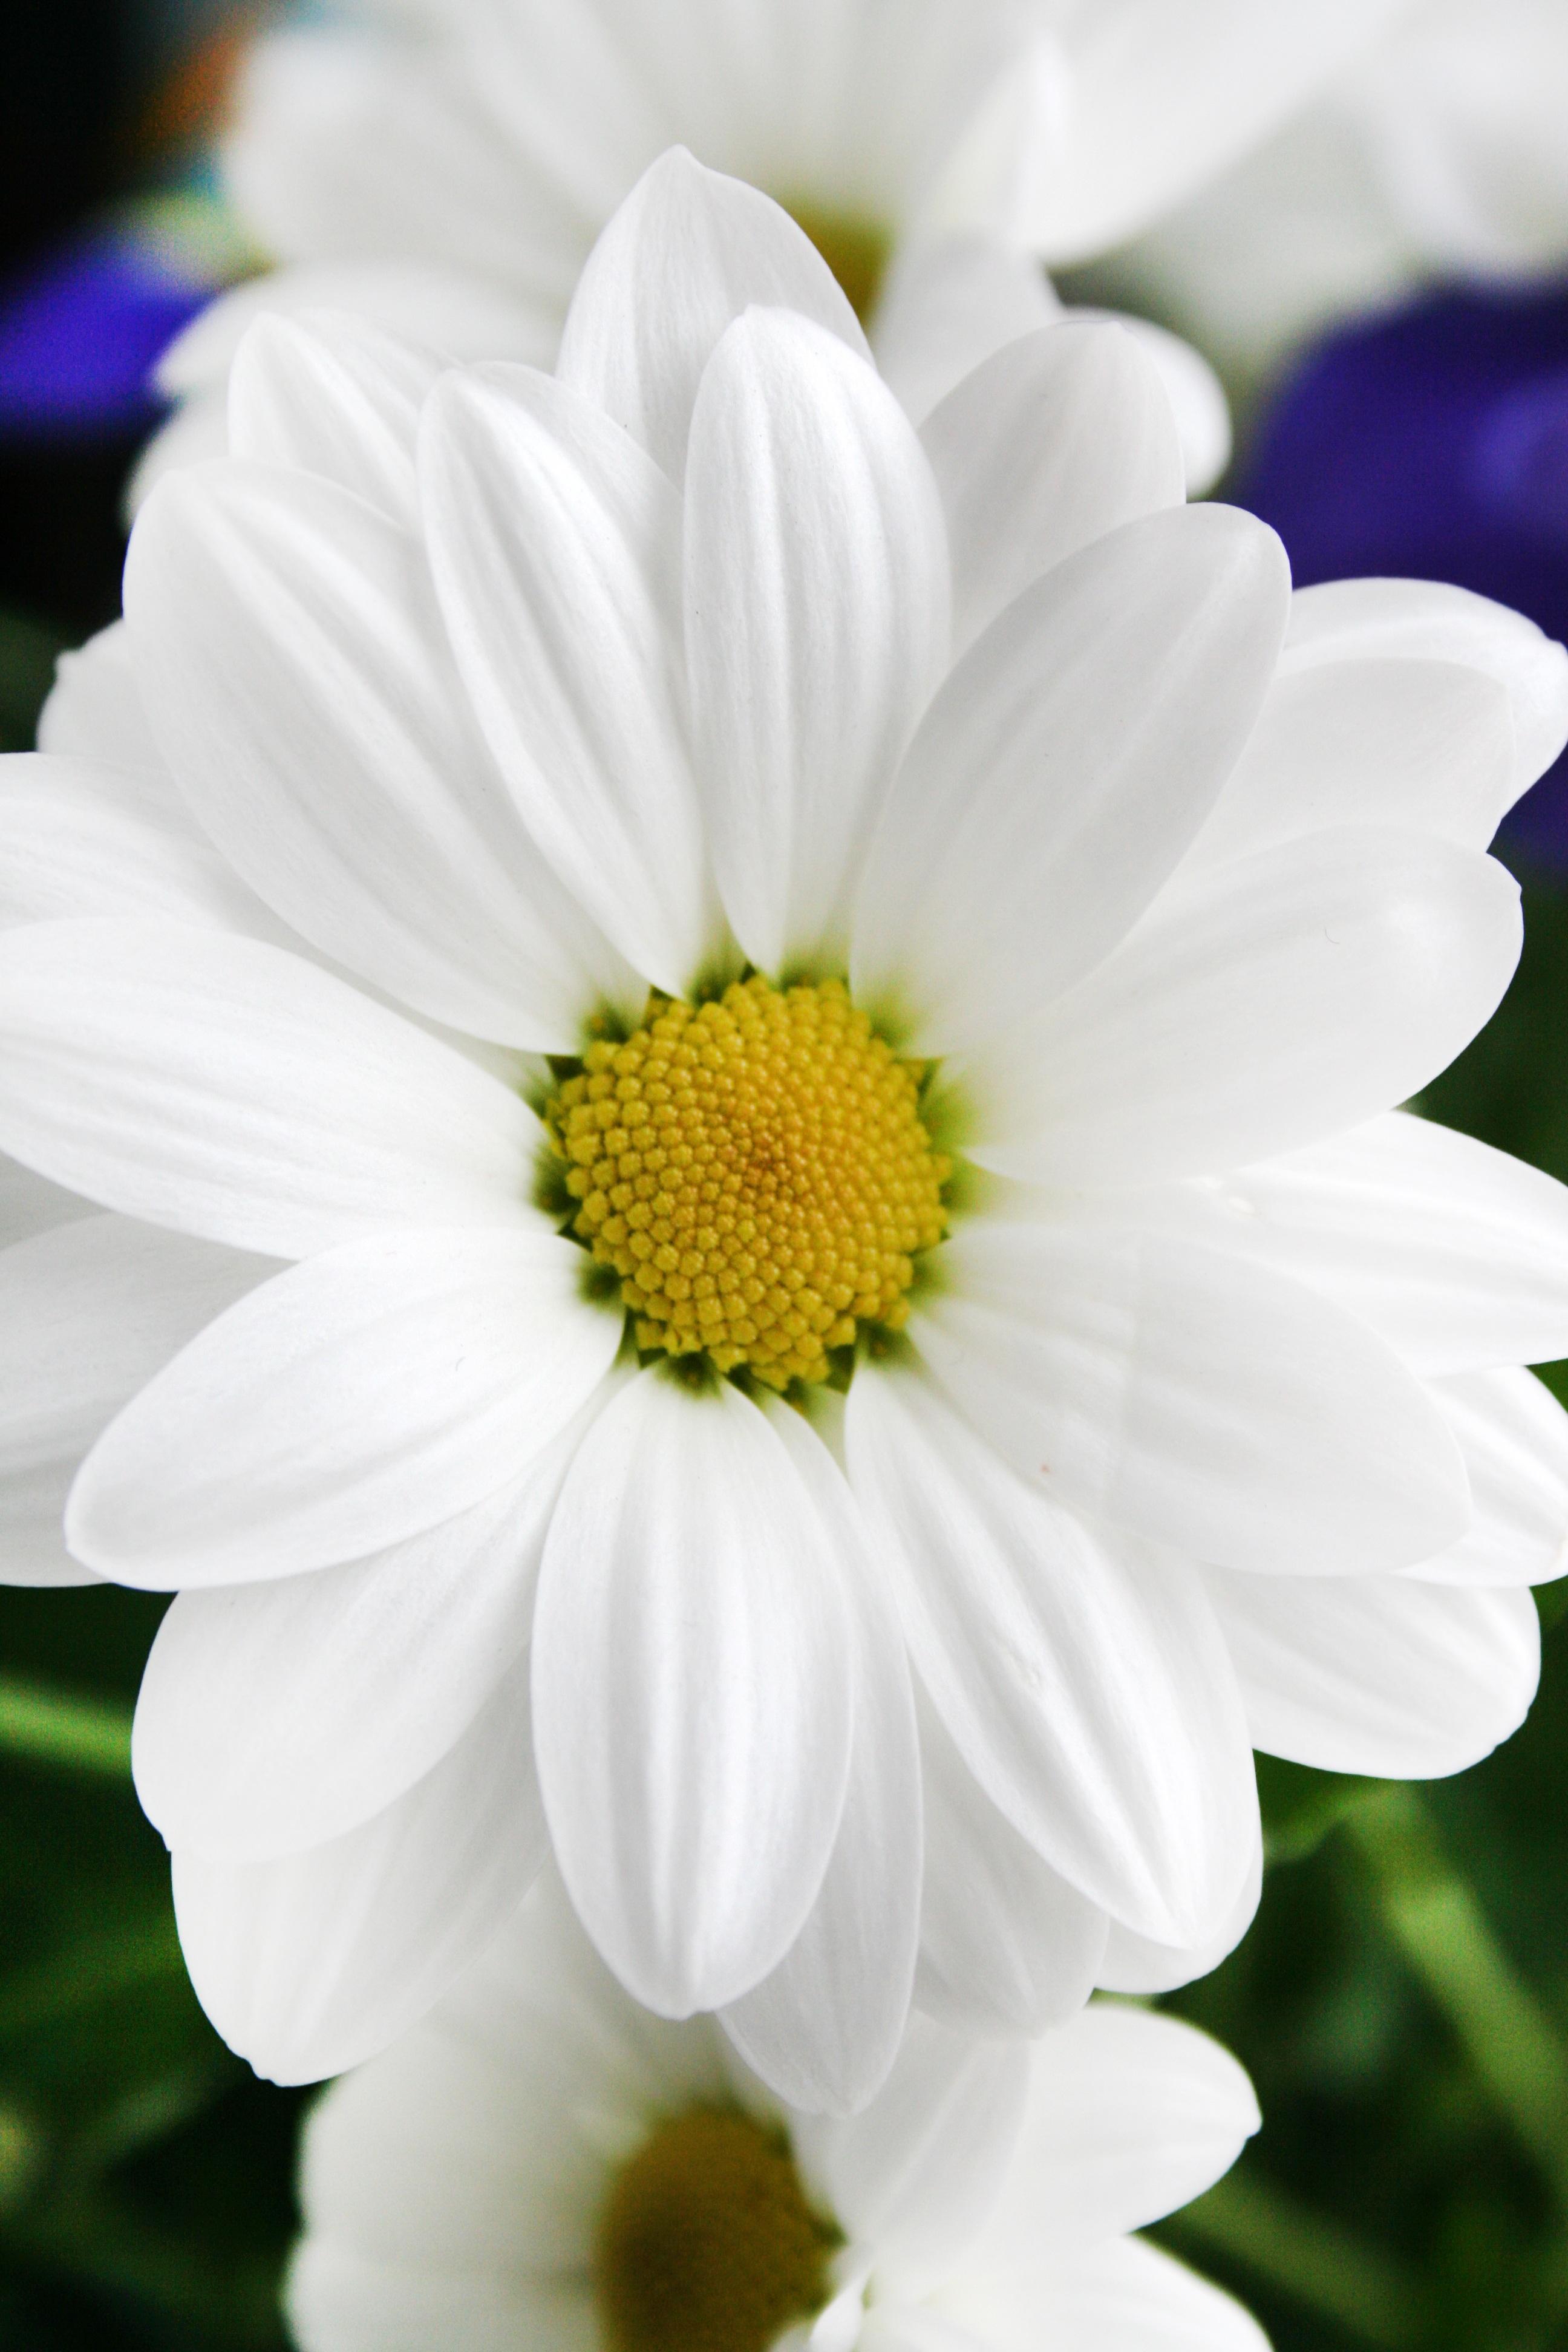 Free Images Nature Blossom White Petal Flora Close Up Cut